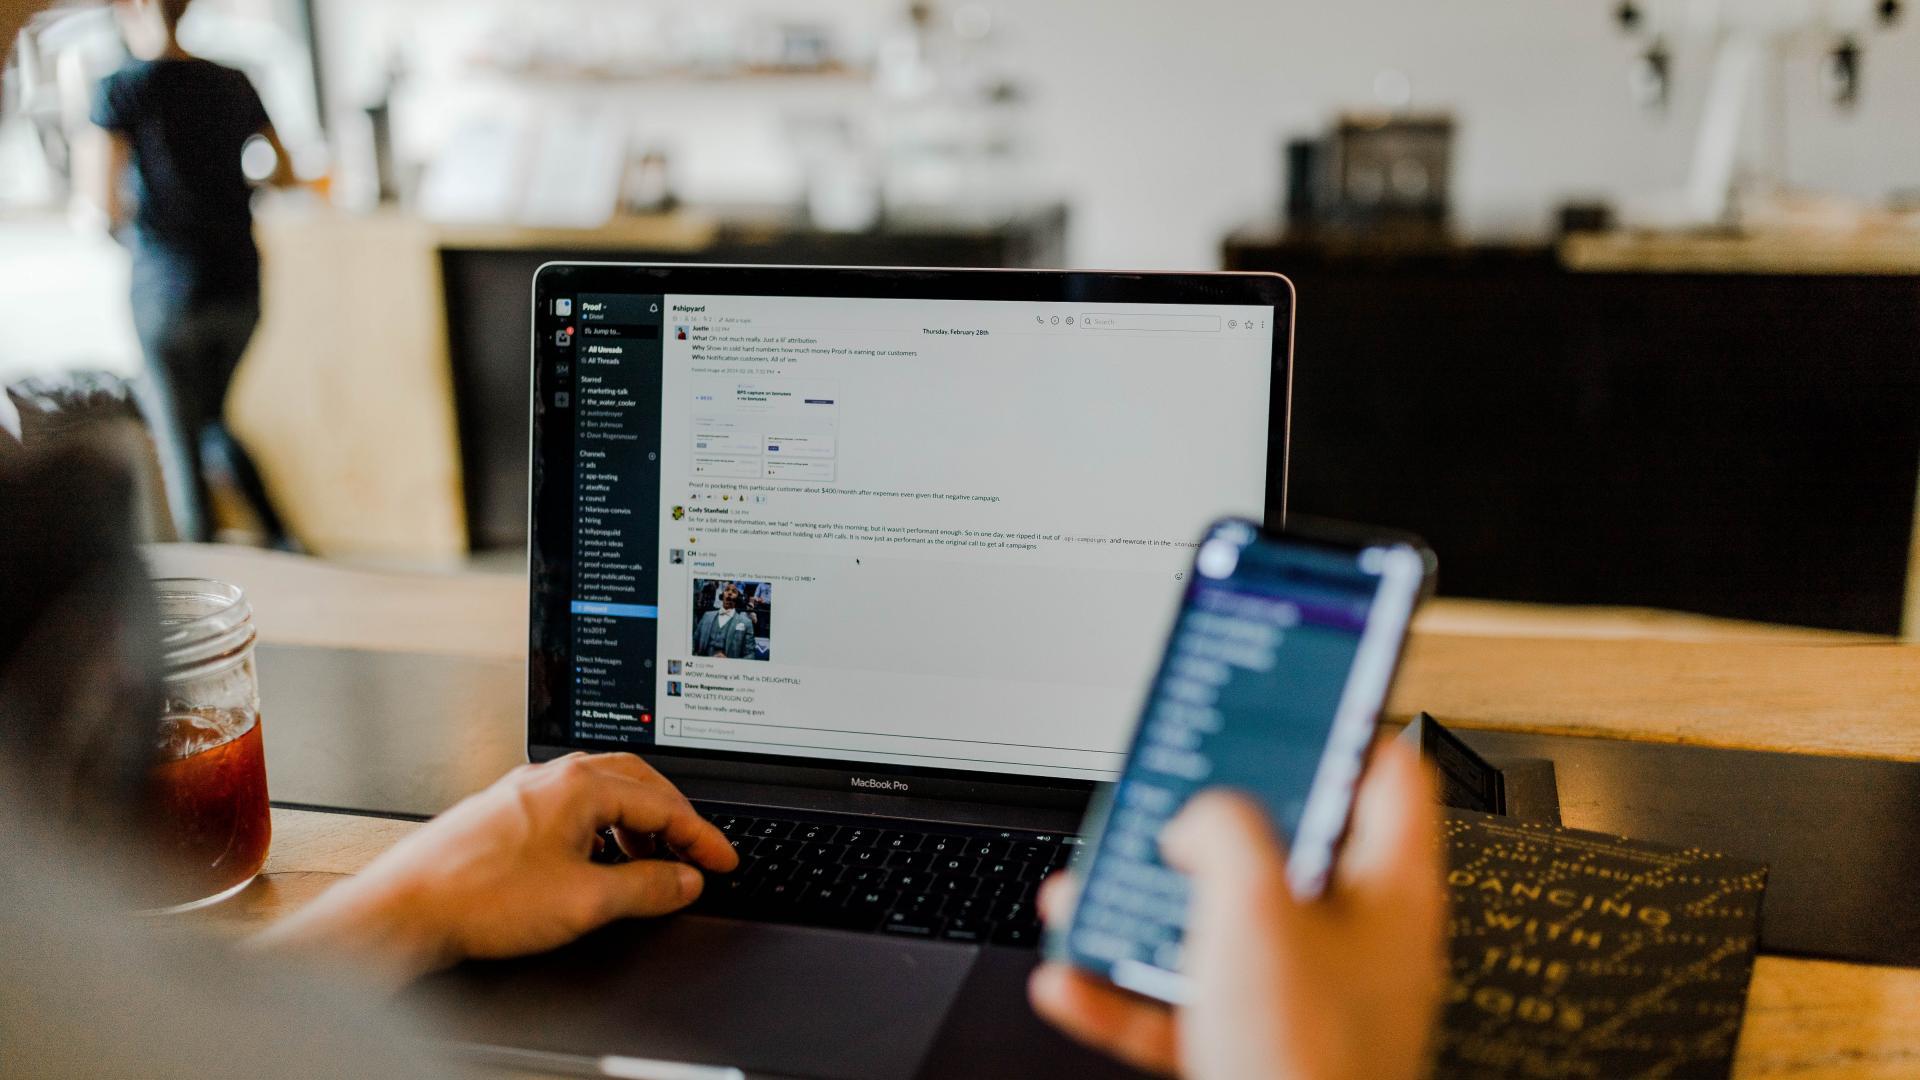 Daten arbeiten Online busness